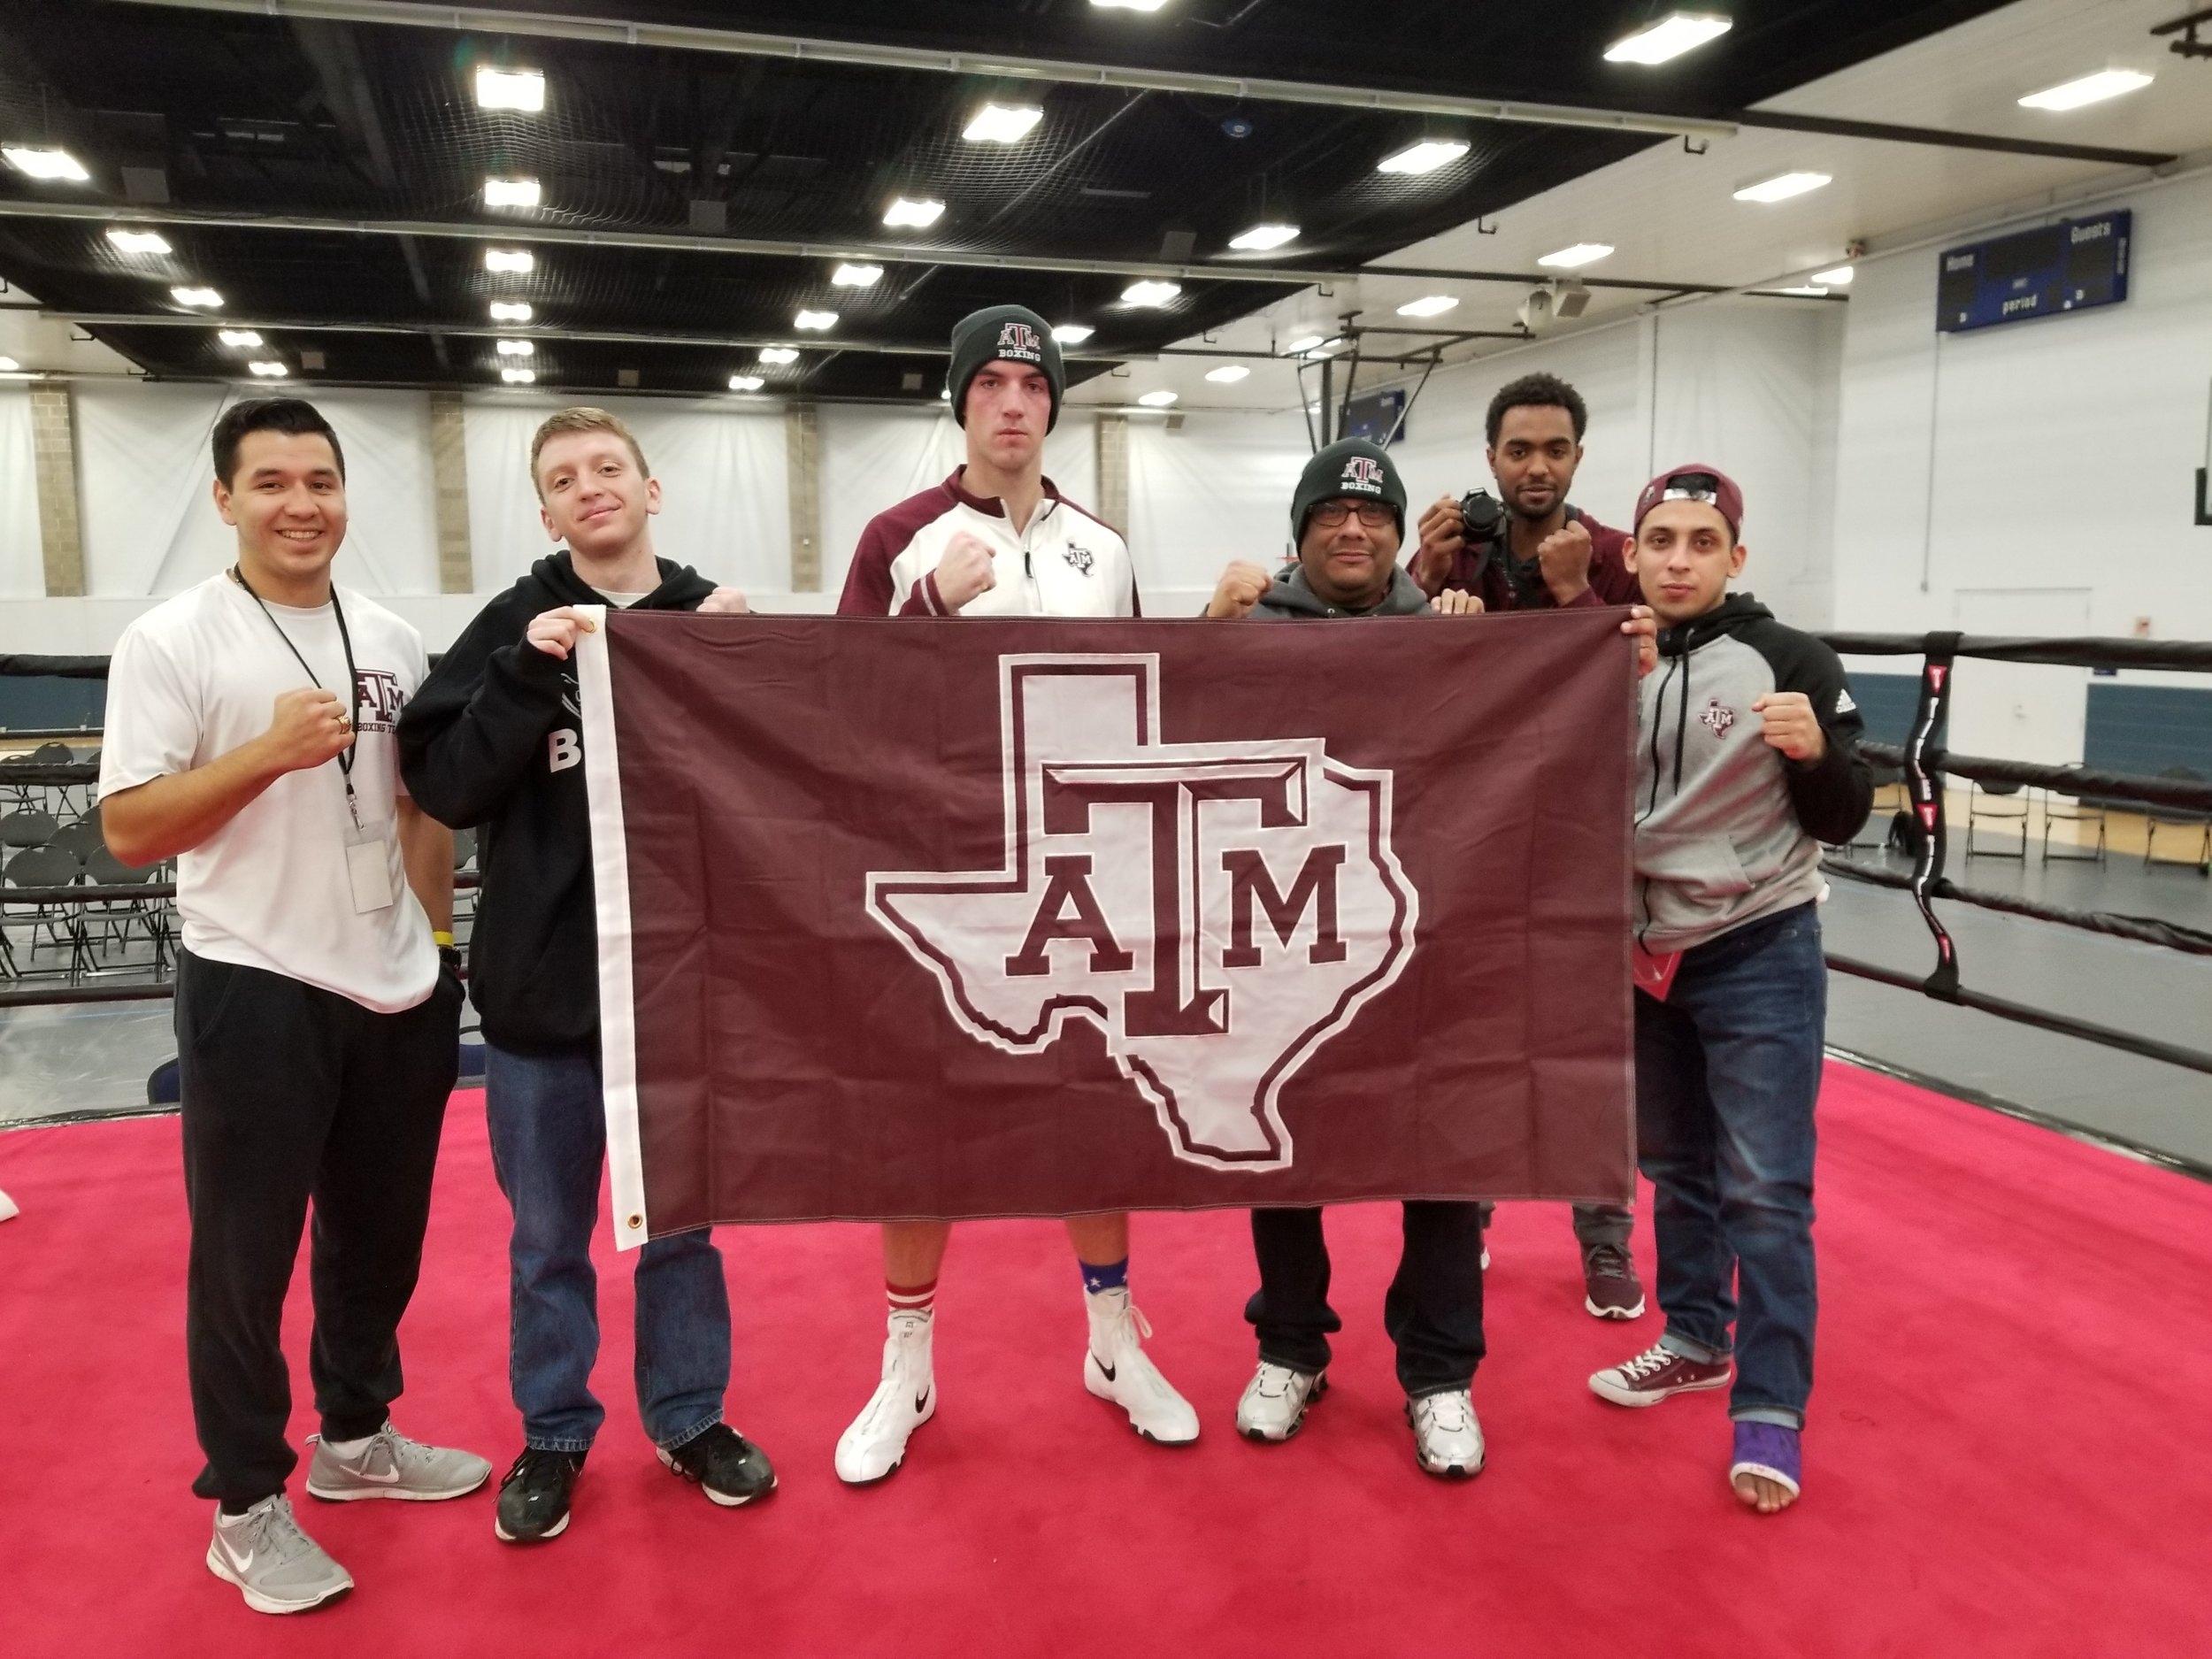 Noah Douglas, USIBA Student Athlete Representative, and Texas A & M Team